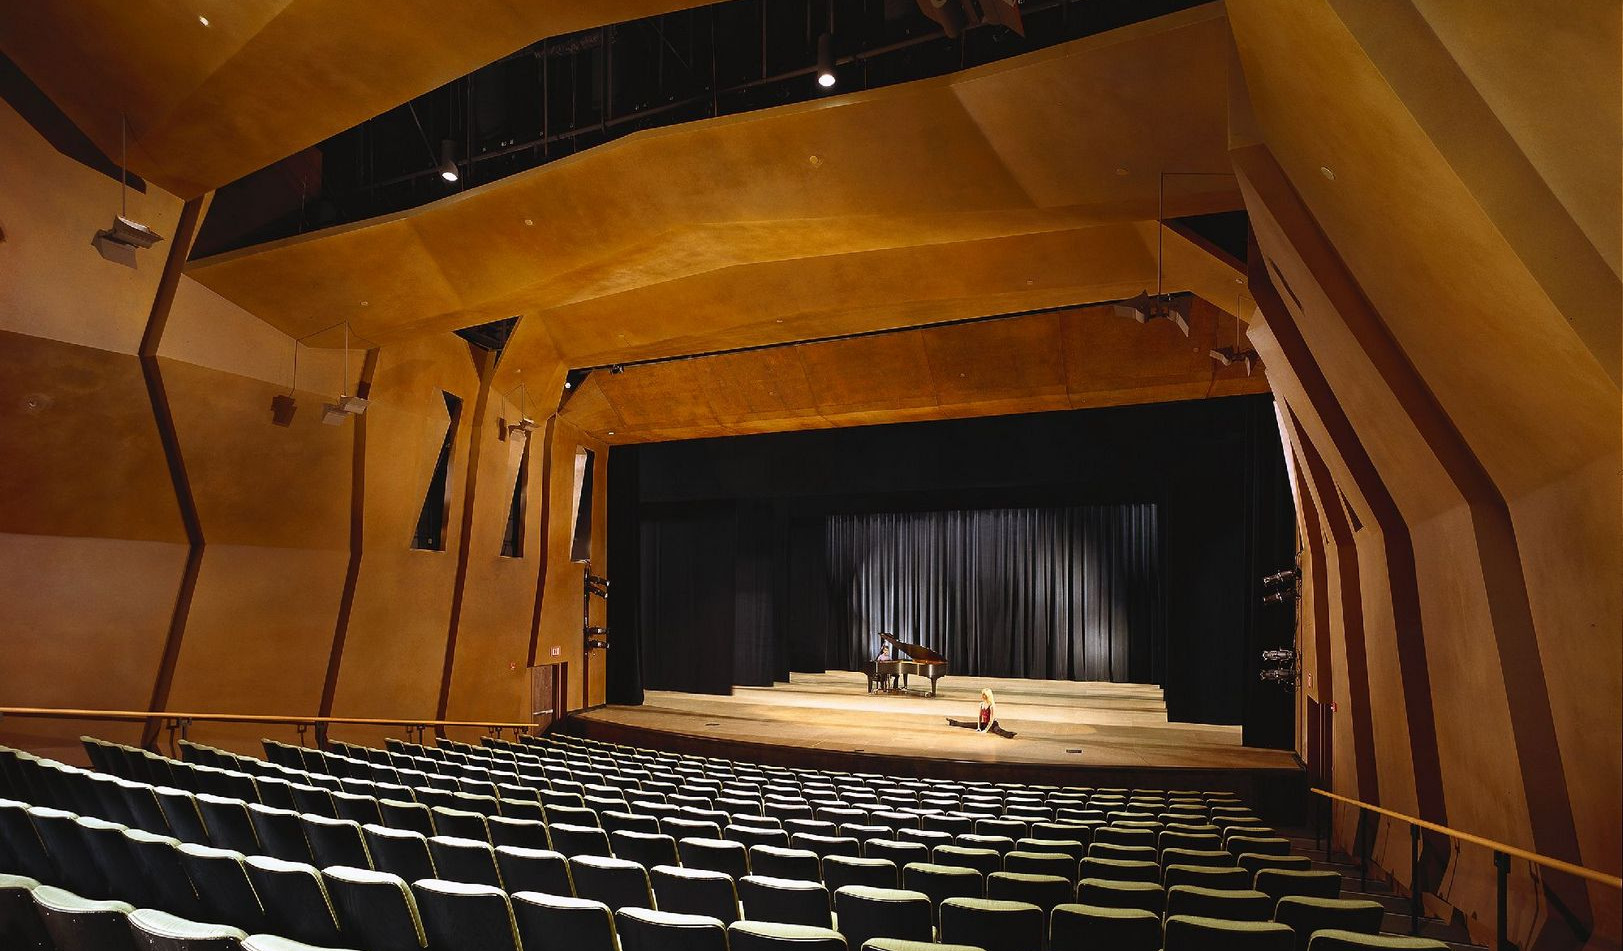 U of A - Stevie Eller Dance Theatre